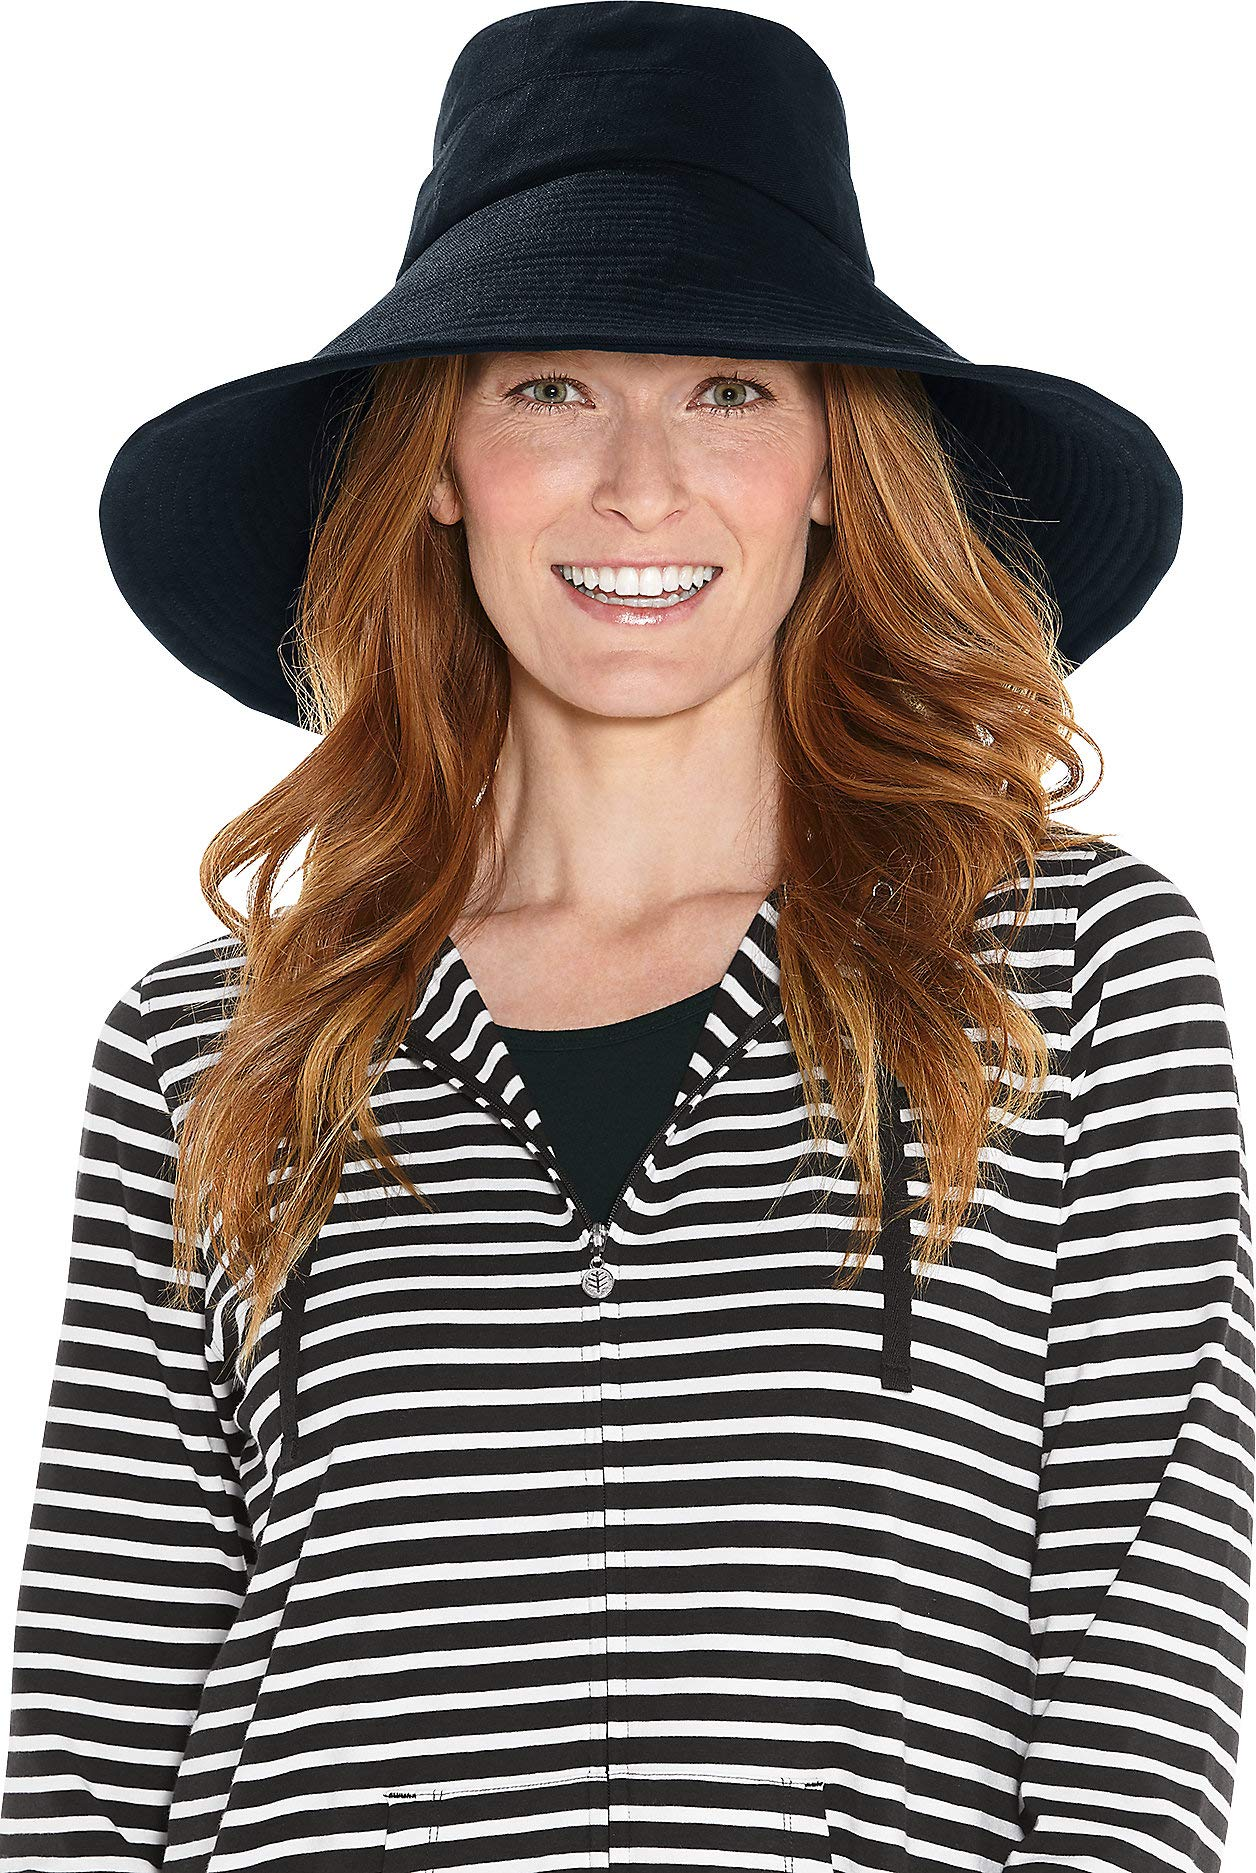 Coolibar UPF 50+ Women's Beach Hat - Sun Protective (One Size- Black)